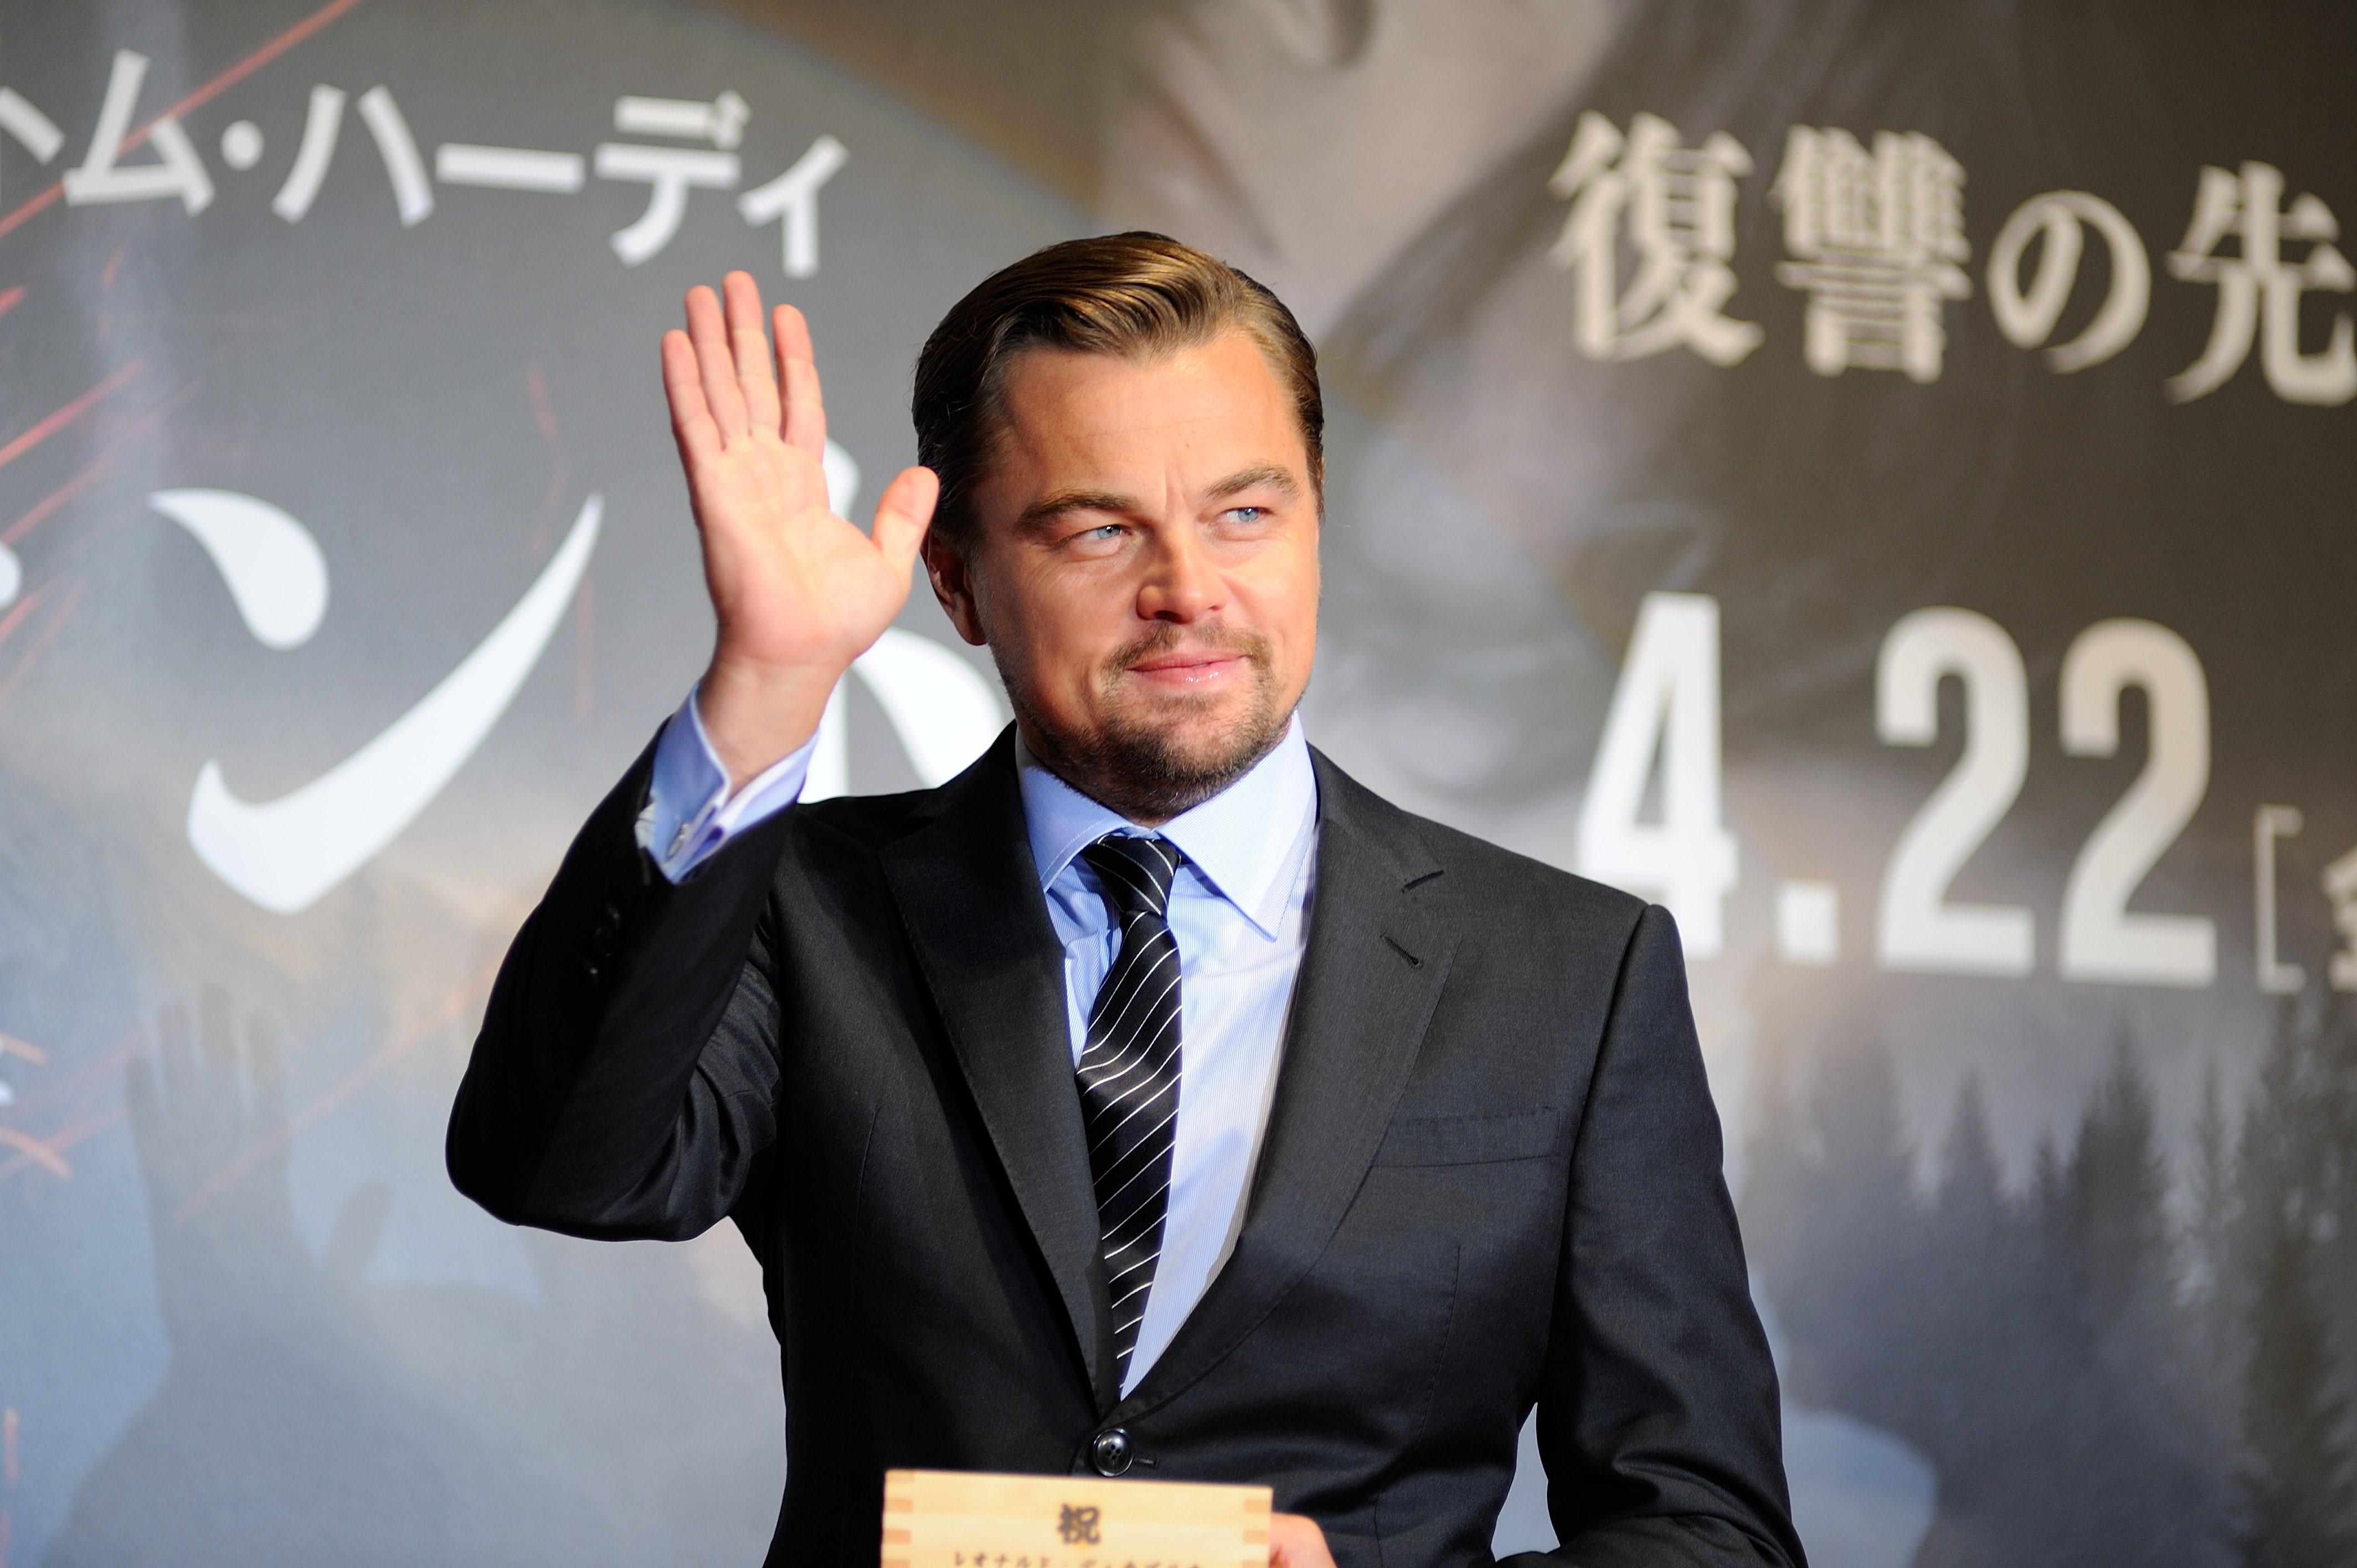 Reddit users reveal what celebrities like Leonardo DiCaprio, JK Rowling and Kanye West were like at school